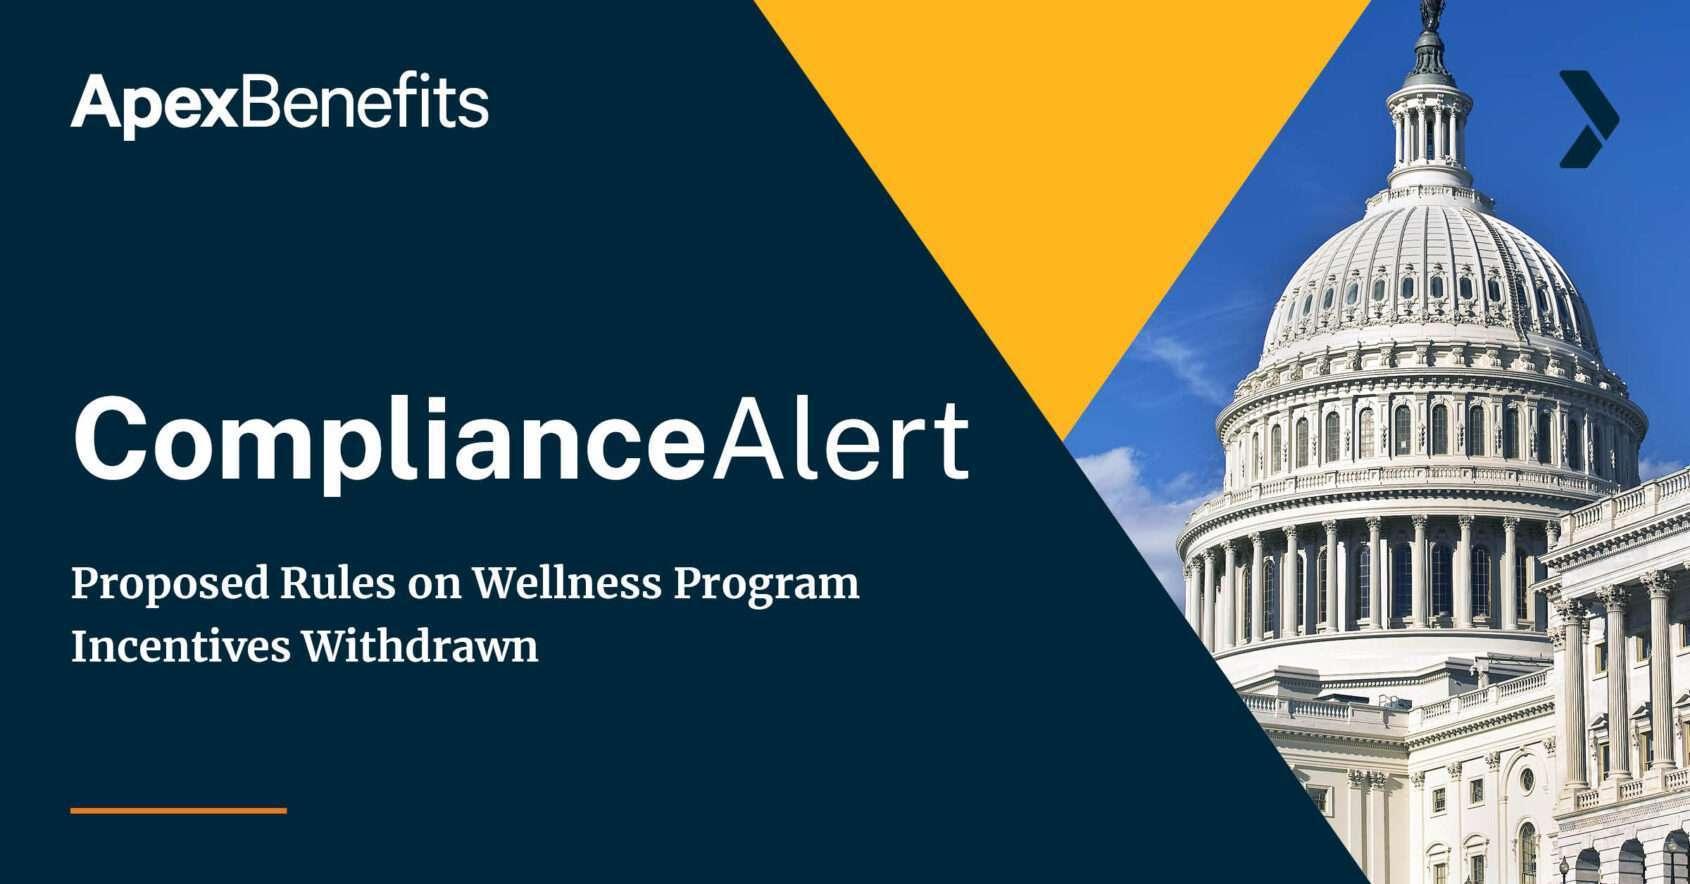 Proposed Wellness Program Withdrawn